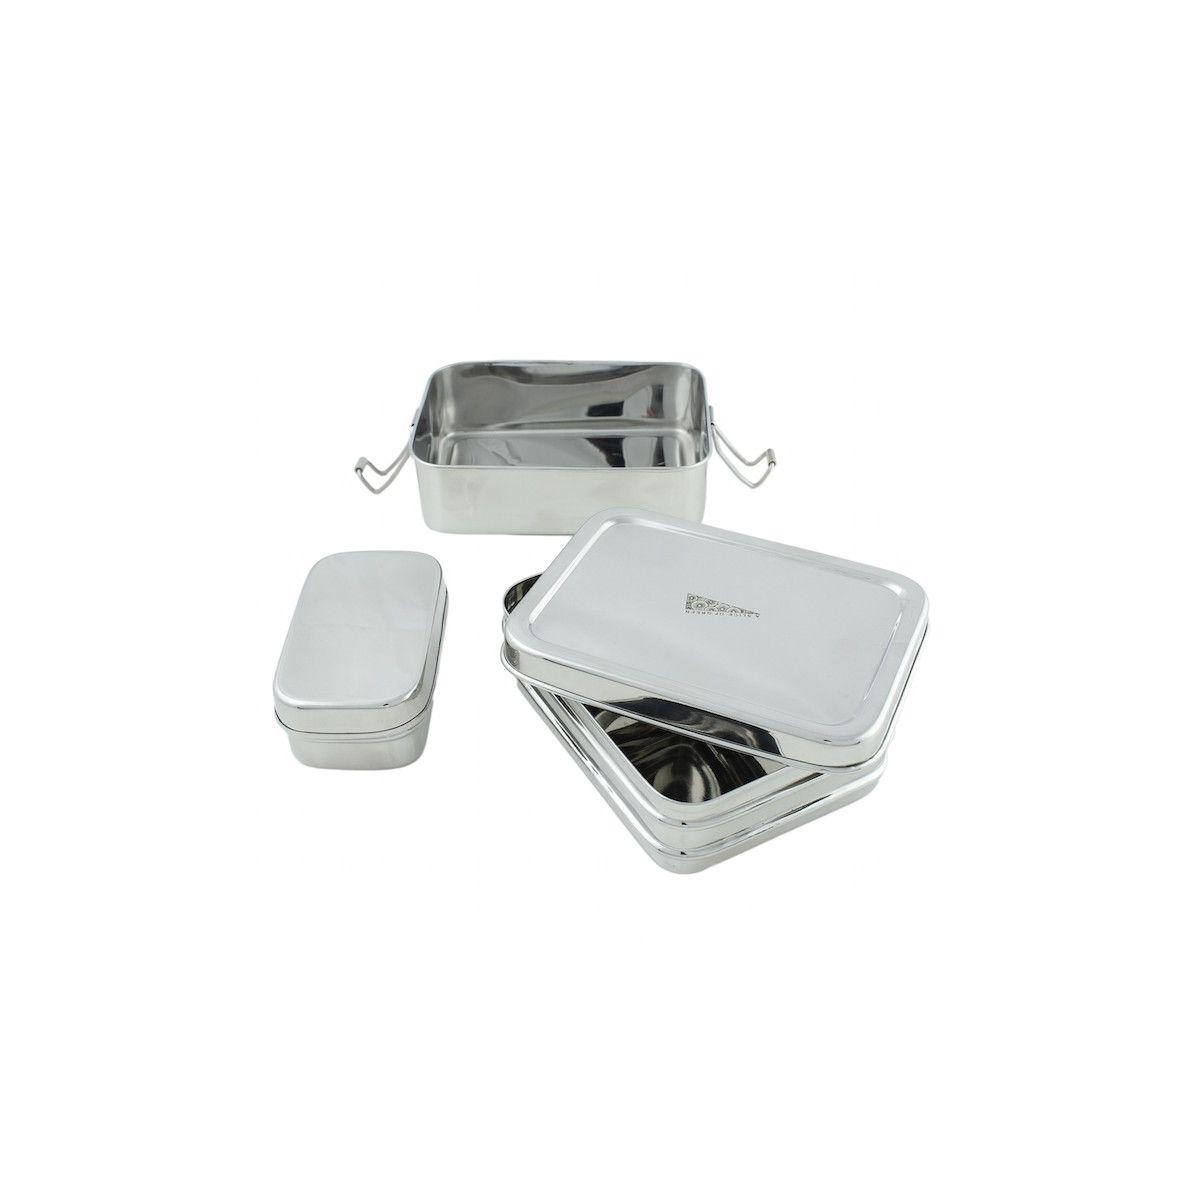 Bo te en inox avec deux tages et mini r cipient 900 ml for Recipient inox cuisine